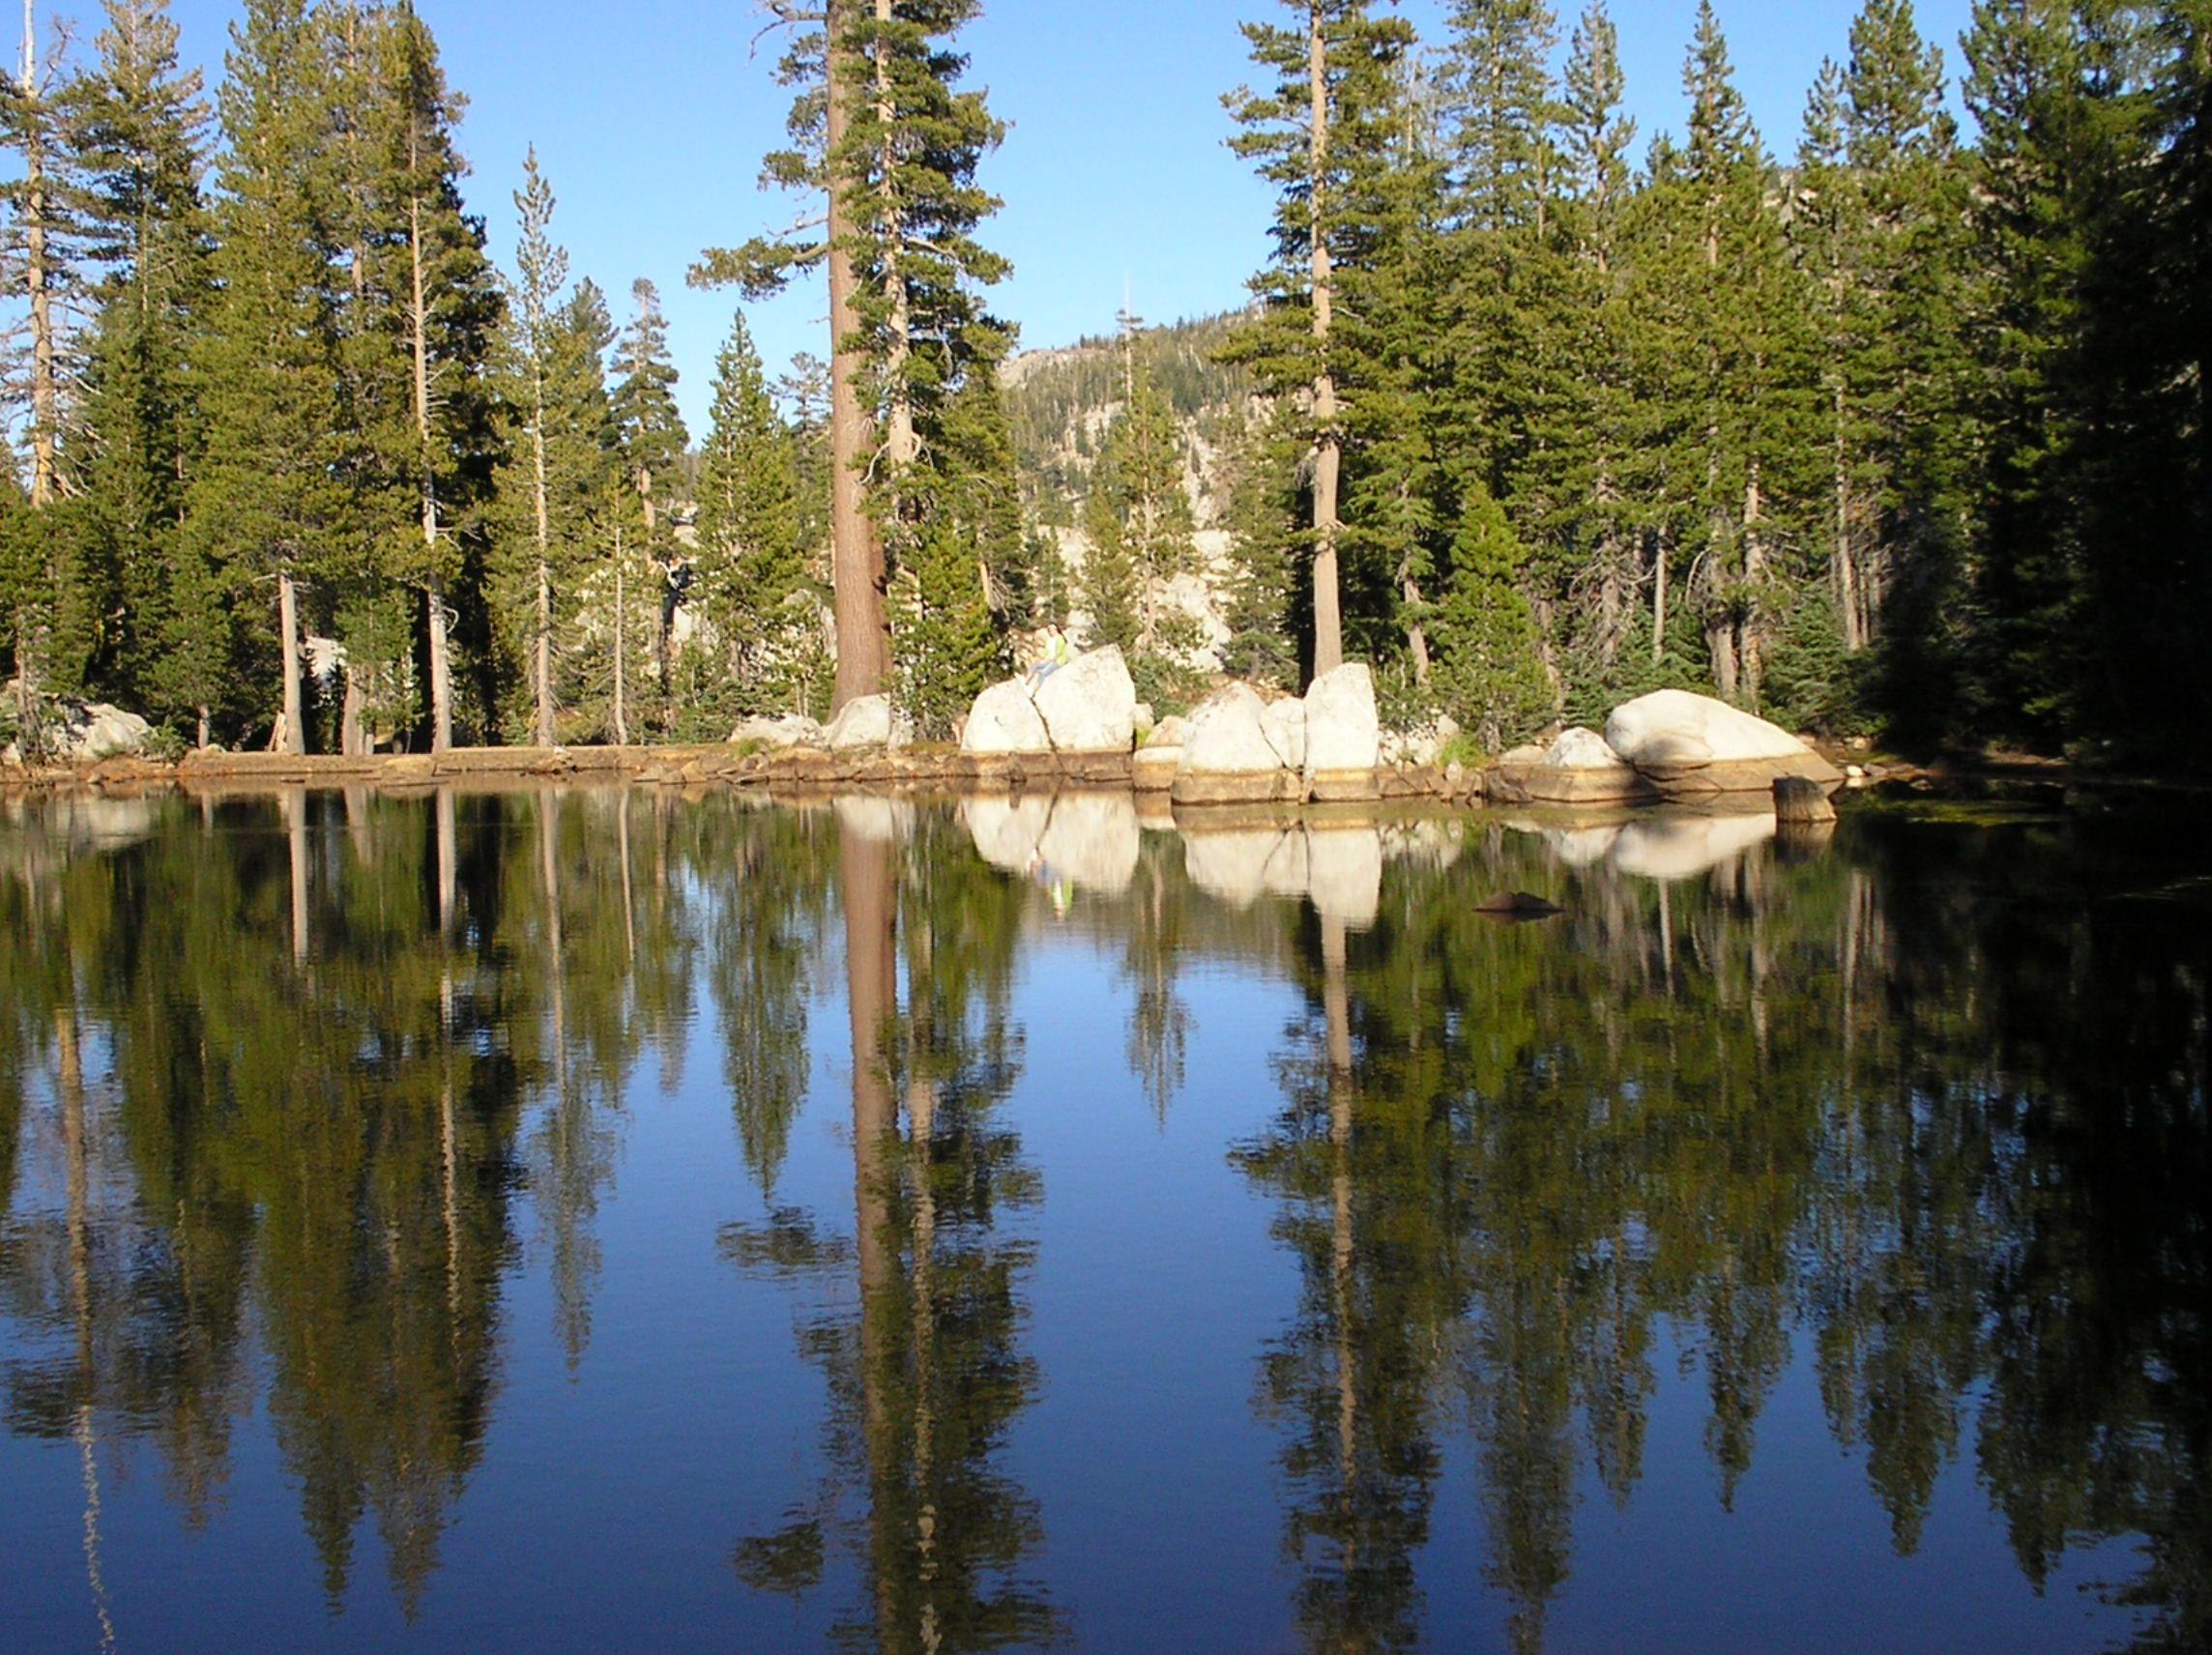 Mosquito lake alpine county ca california photos day